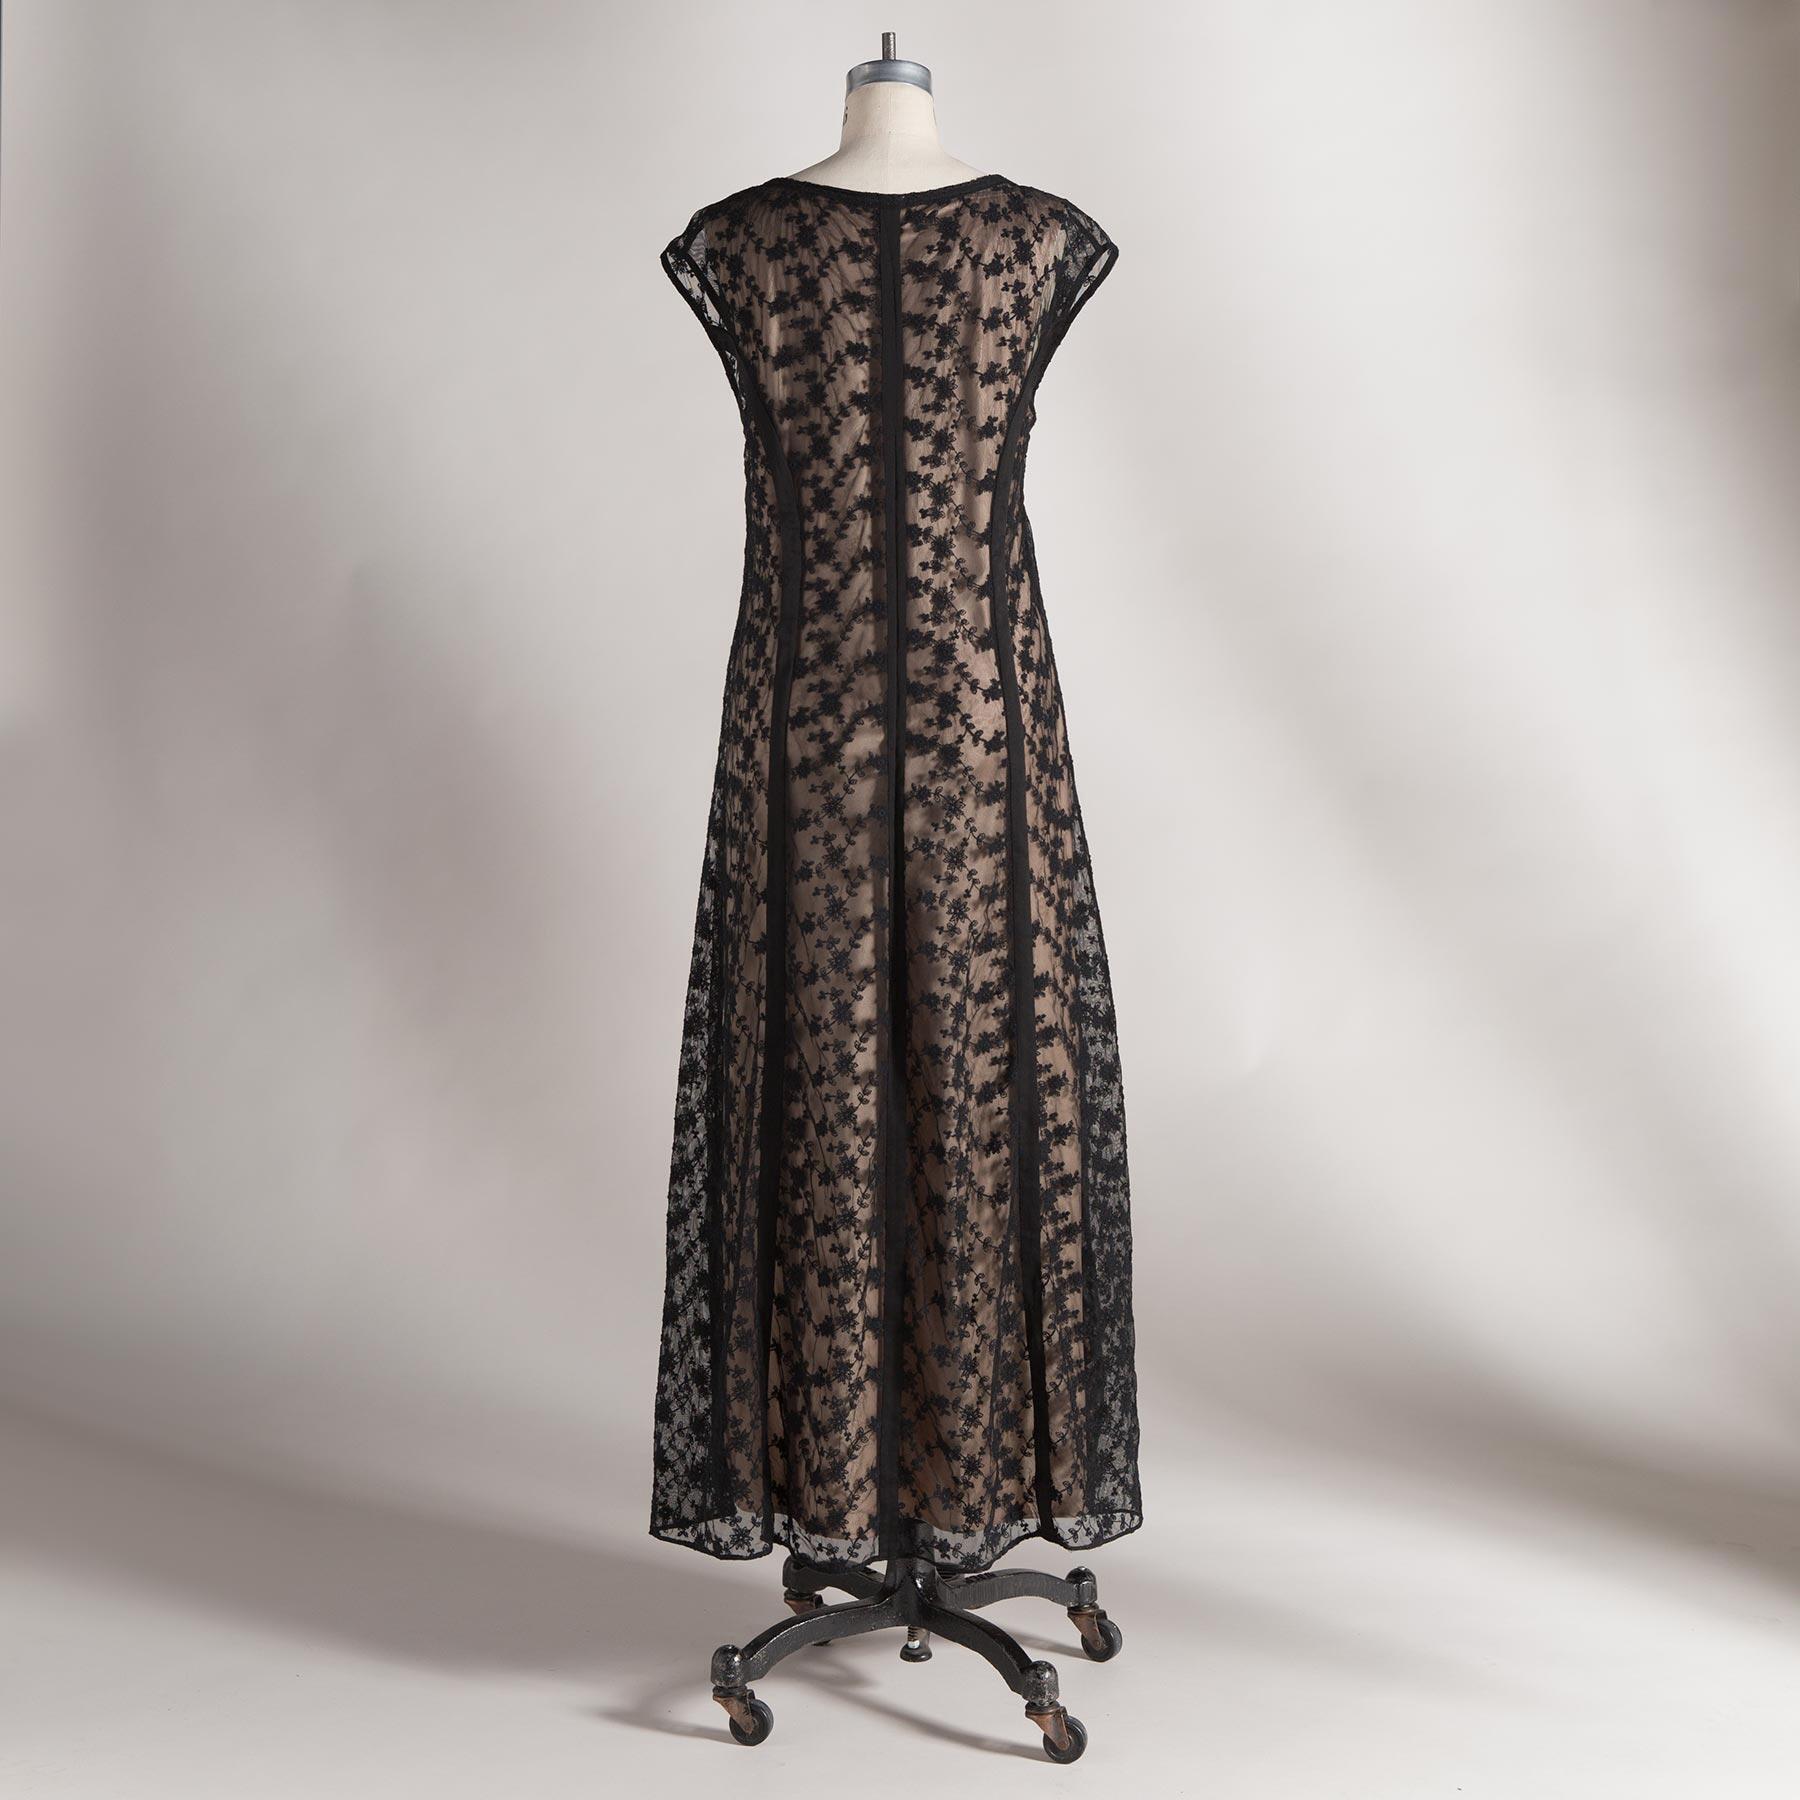 CALISTA DRESS - PETITES: View 2